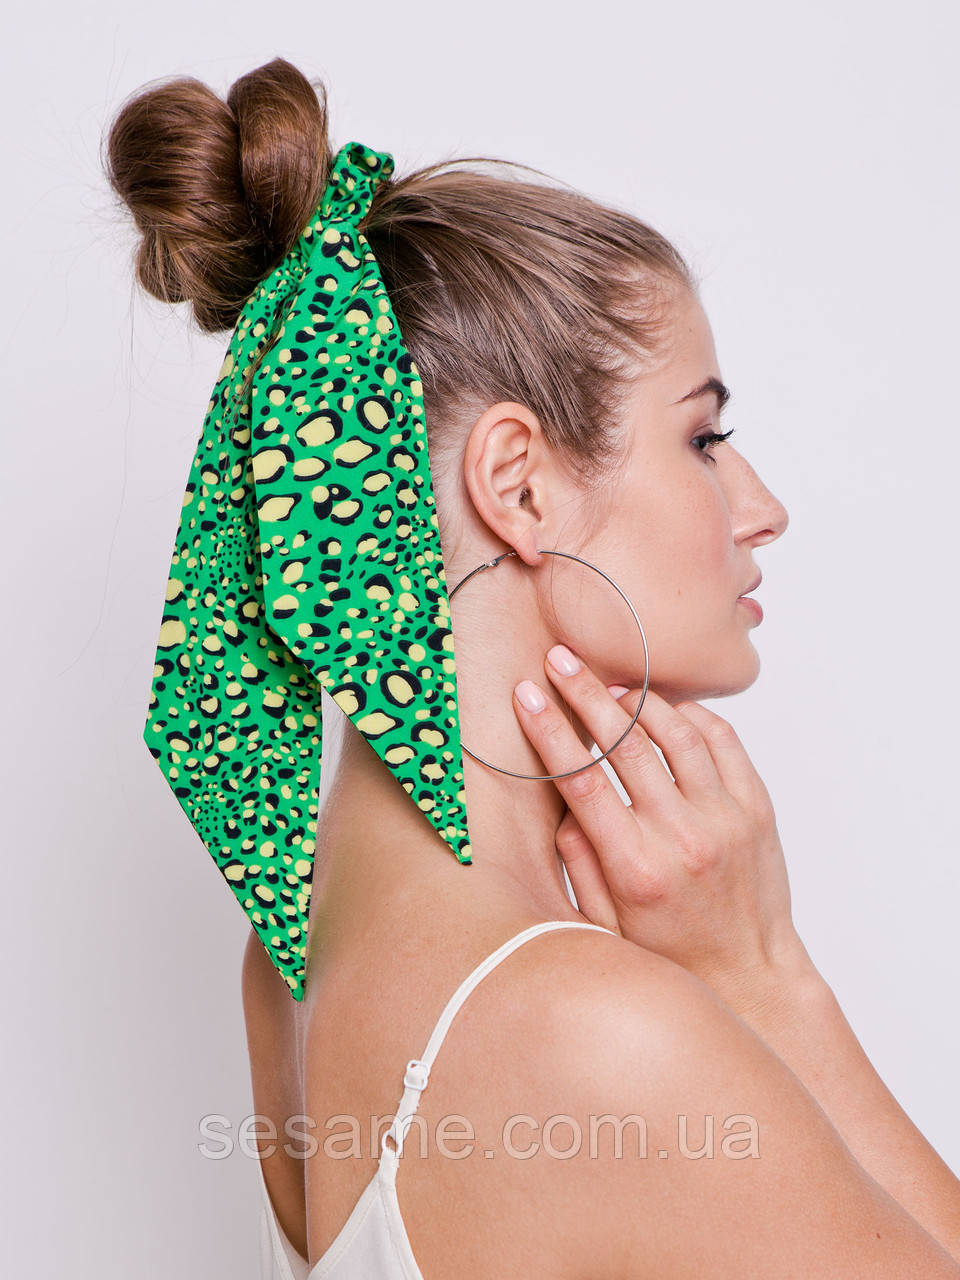 grand ua Фернанда резинка для волос